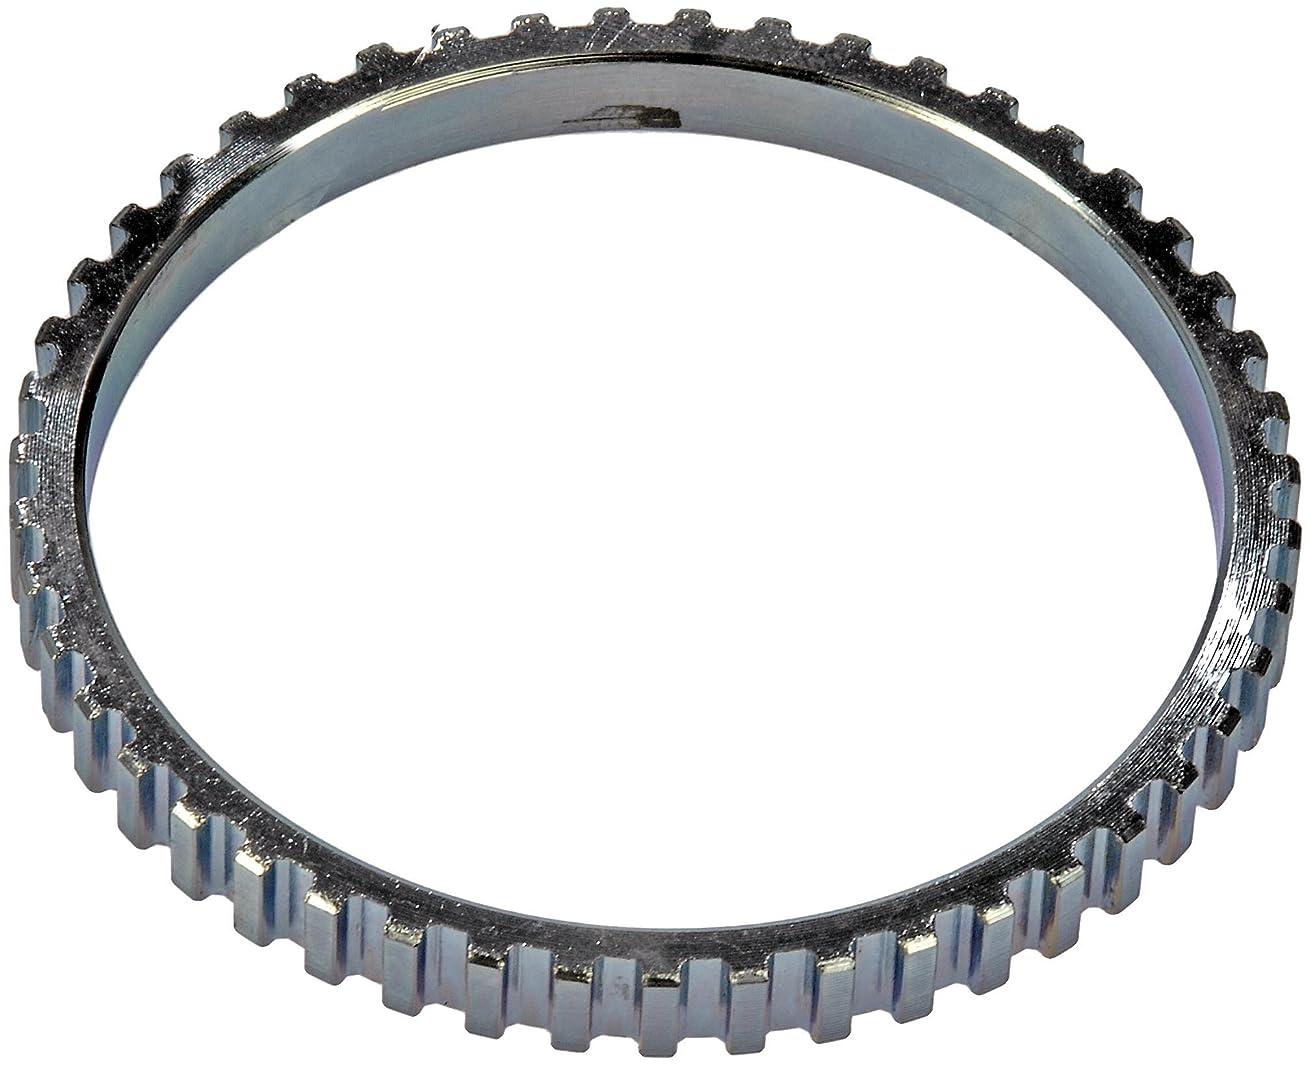 Dorman 917-541 ABS Tone Ring